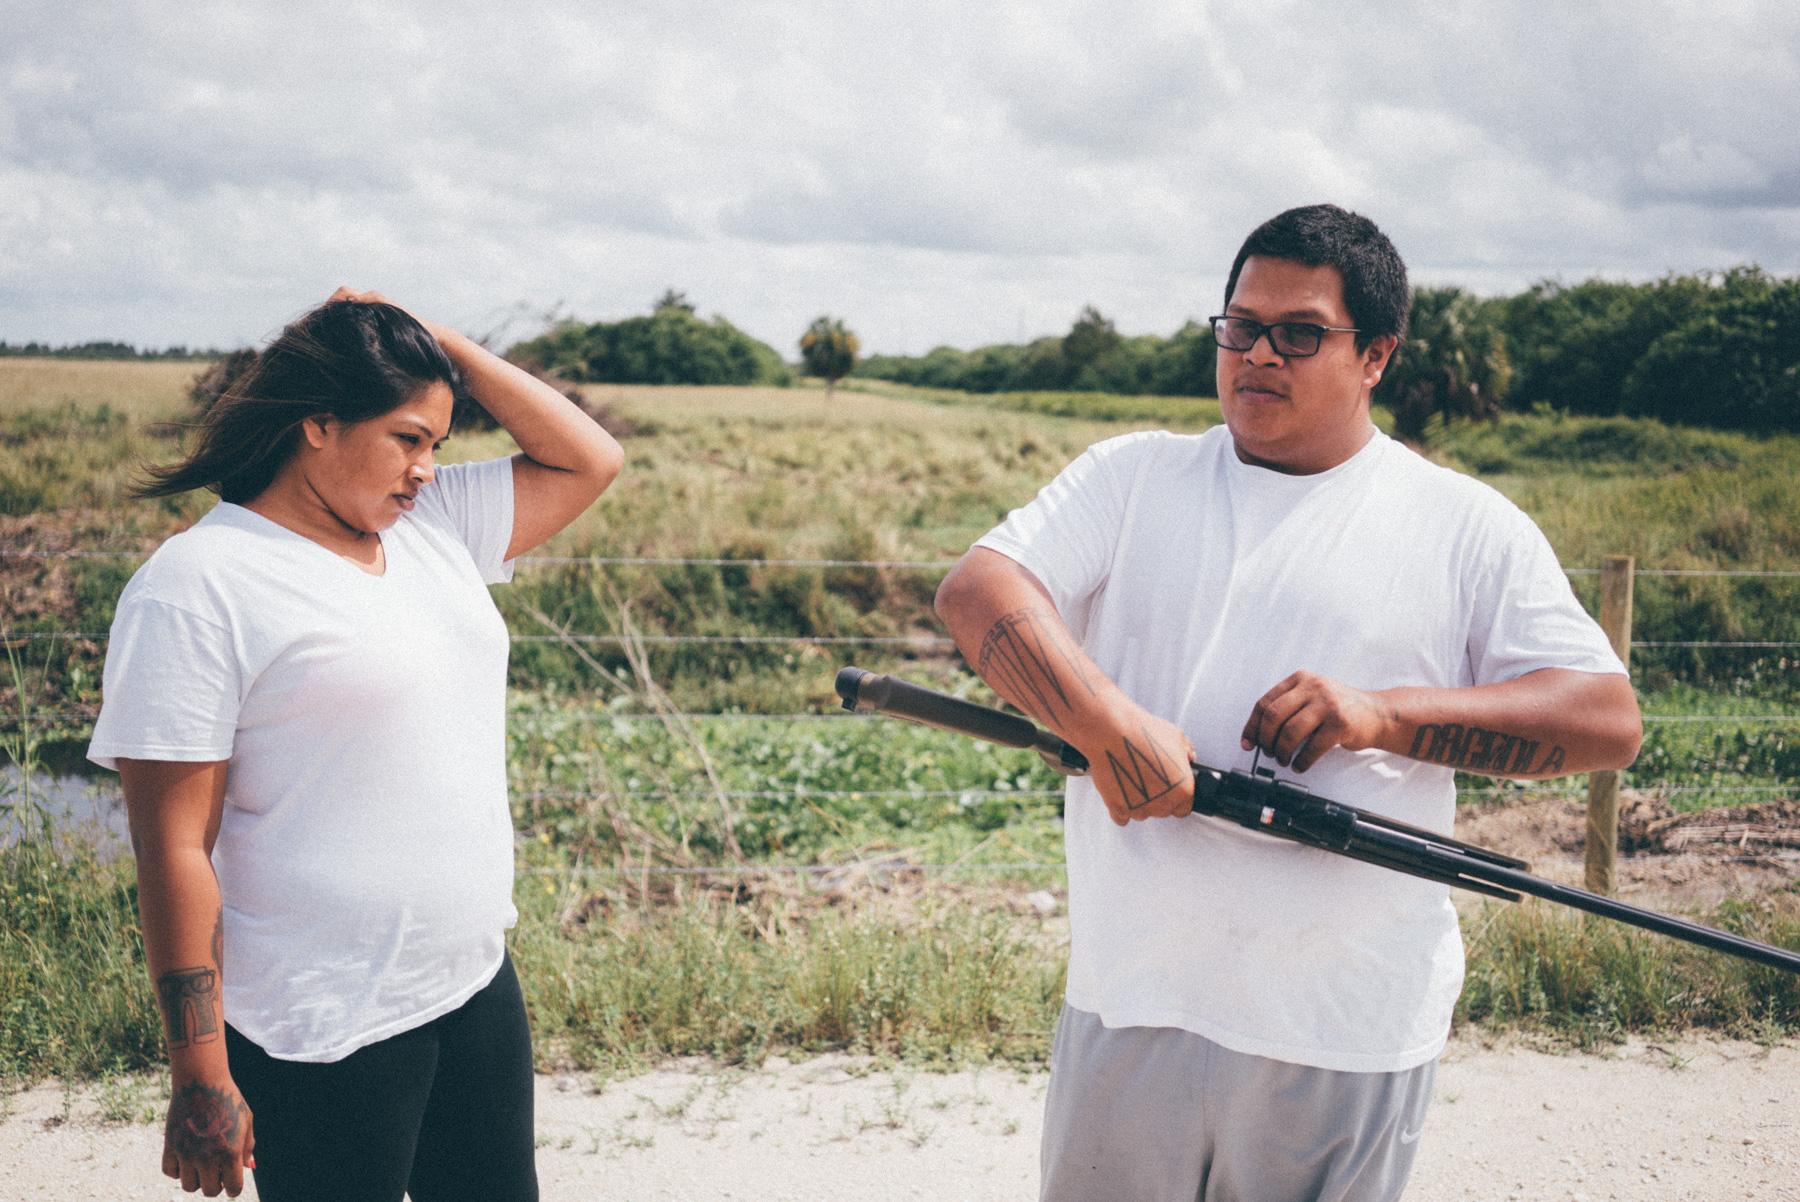 Hunting, Miccosukee Reservation, 2014